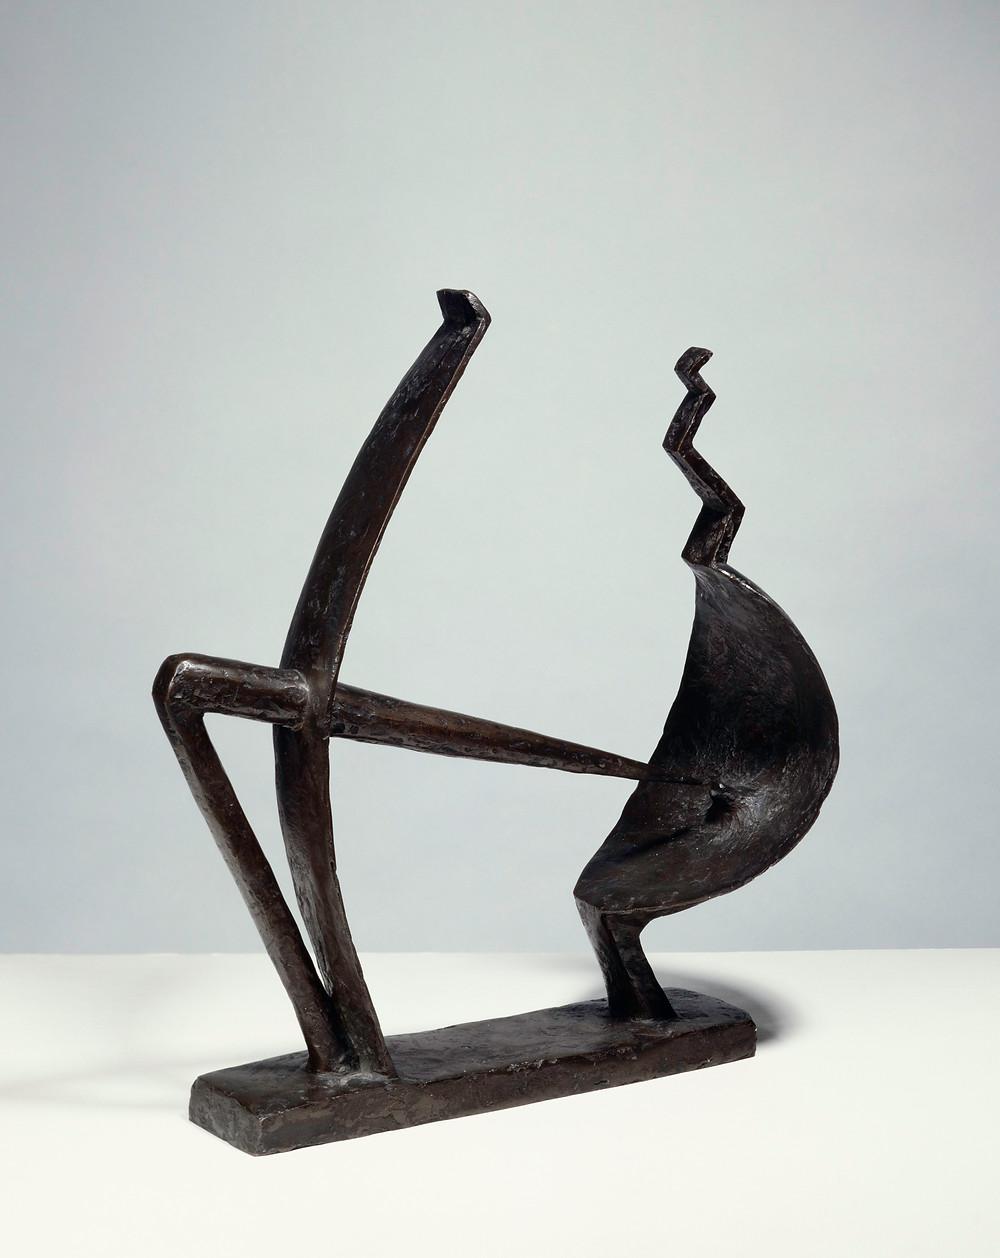 Alberto Giacometti: Férfi és nő, 1928-29